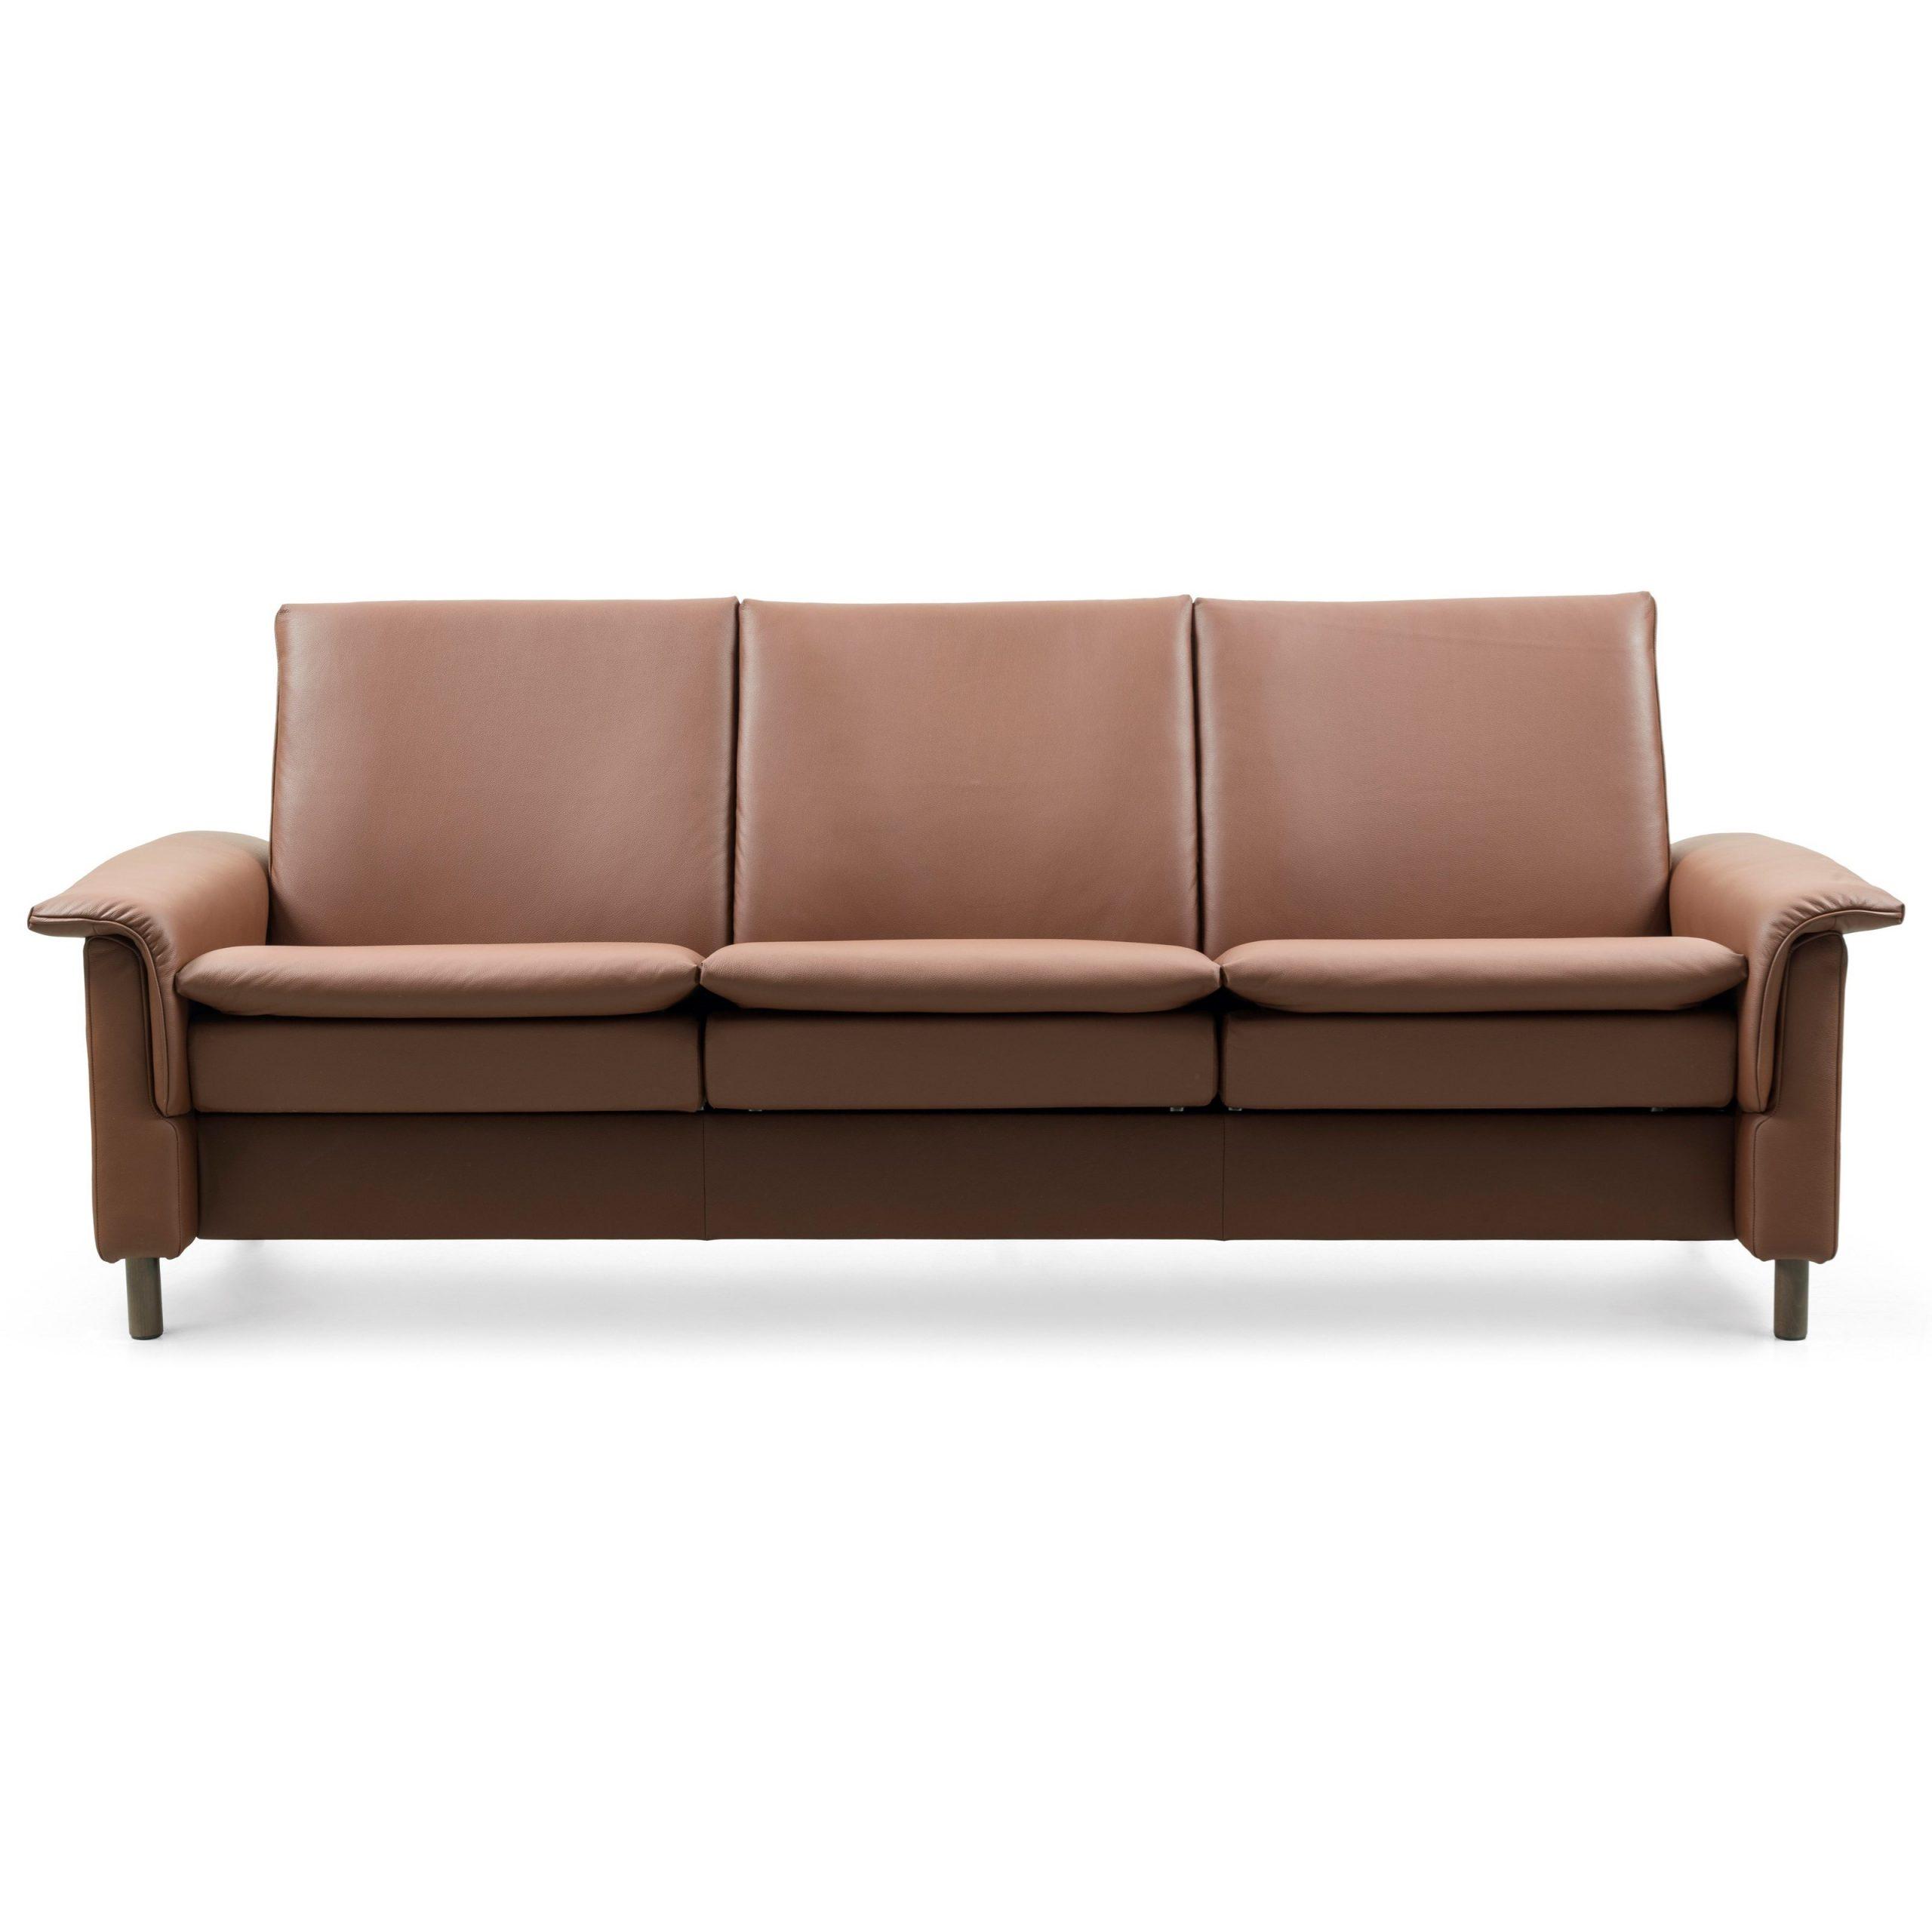 Full Size of Stressless Sofa Stella Sale Furniture Nz Couch Used Cost Leder Bullfrog Stilecht Günstig Kaufen 2er Grau Rolf Benz Inhofer Xora Husse Franz Fertig Ebay Sofa Stressless Sofa